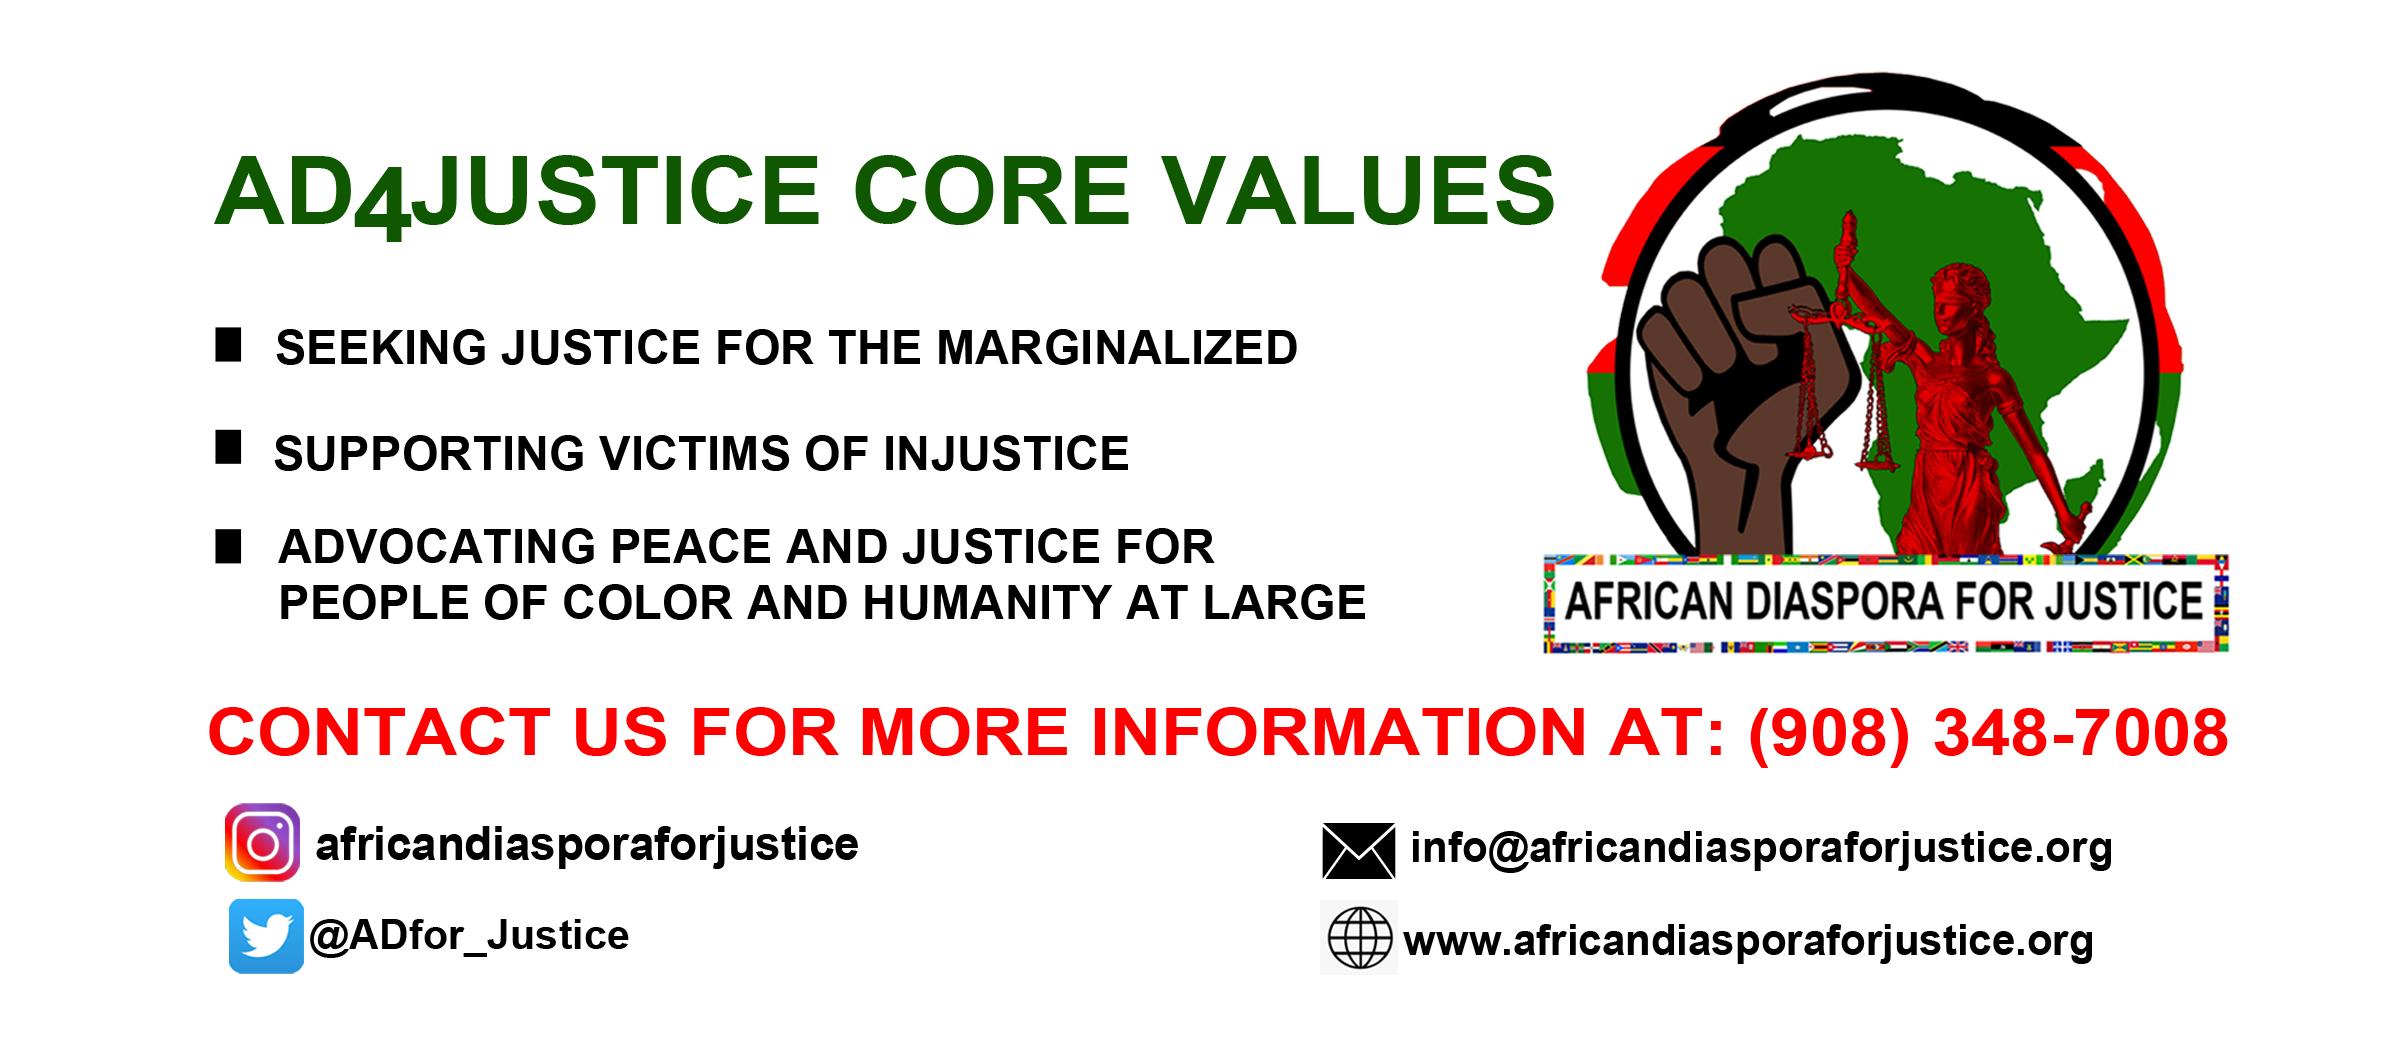 AFRICAN DIASPORA FOR JUSTICE FB COVER